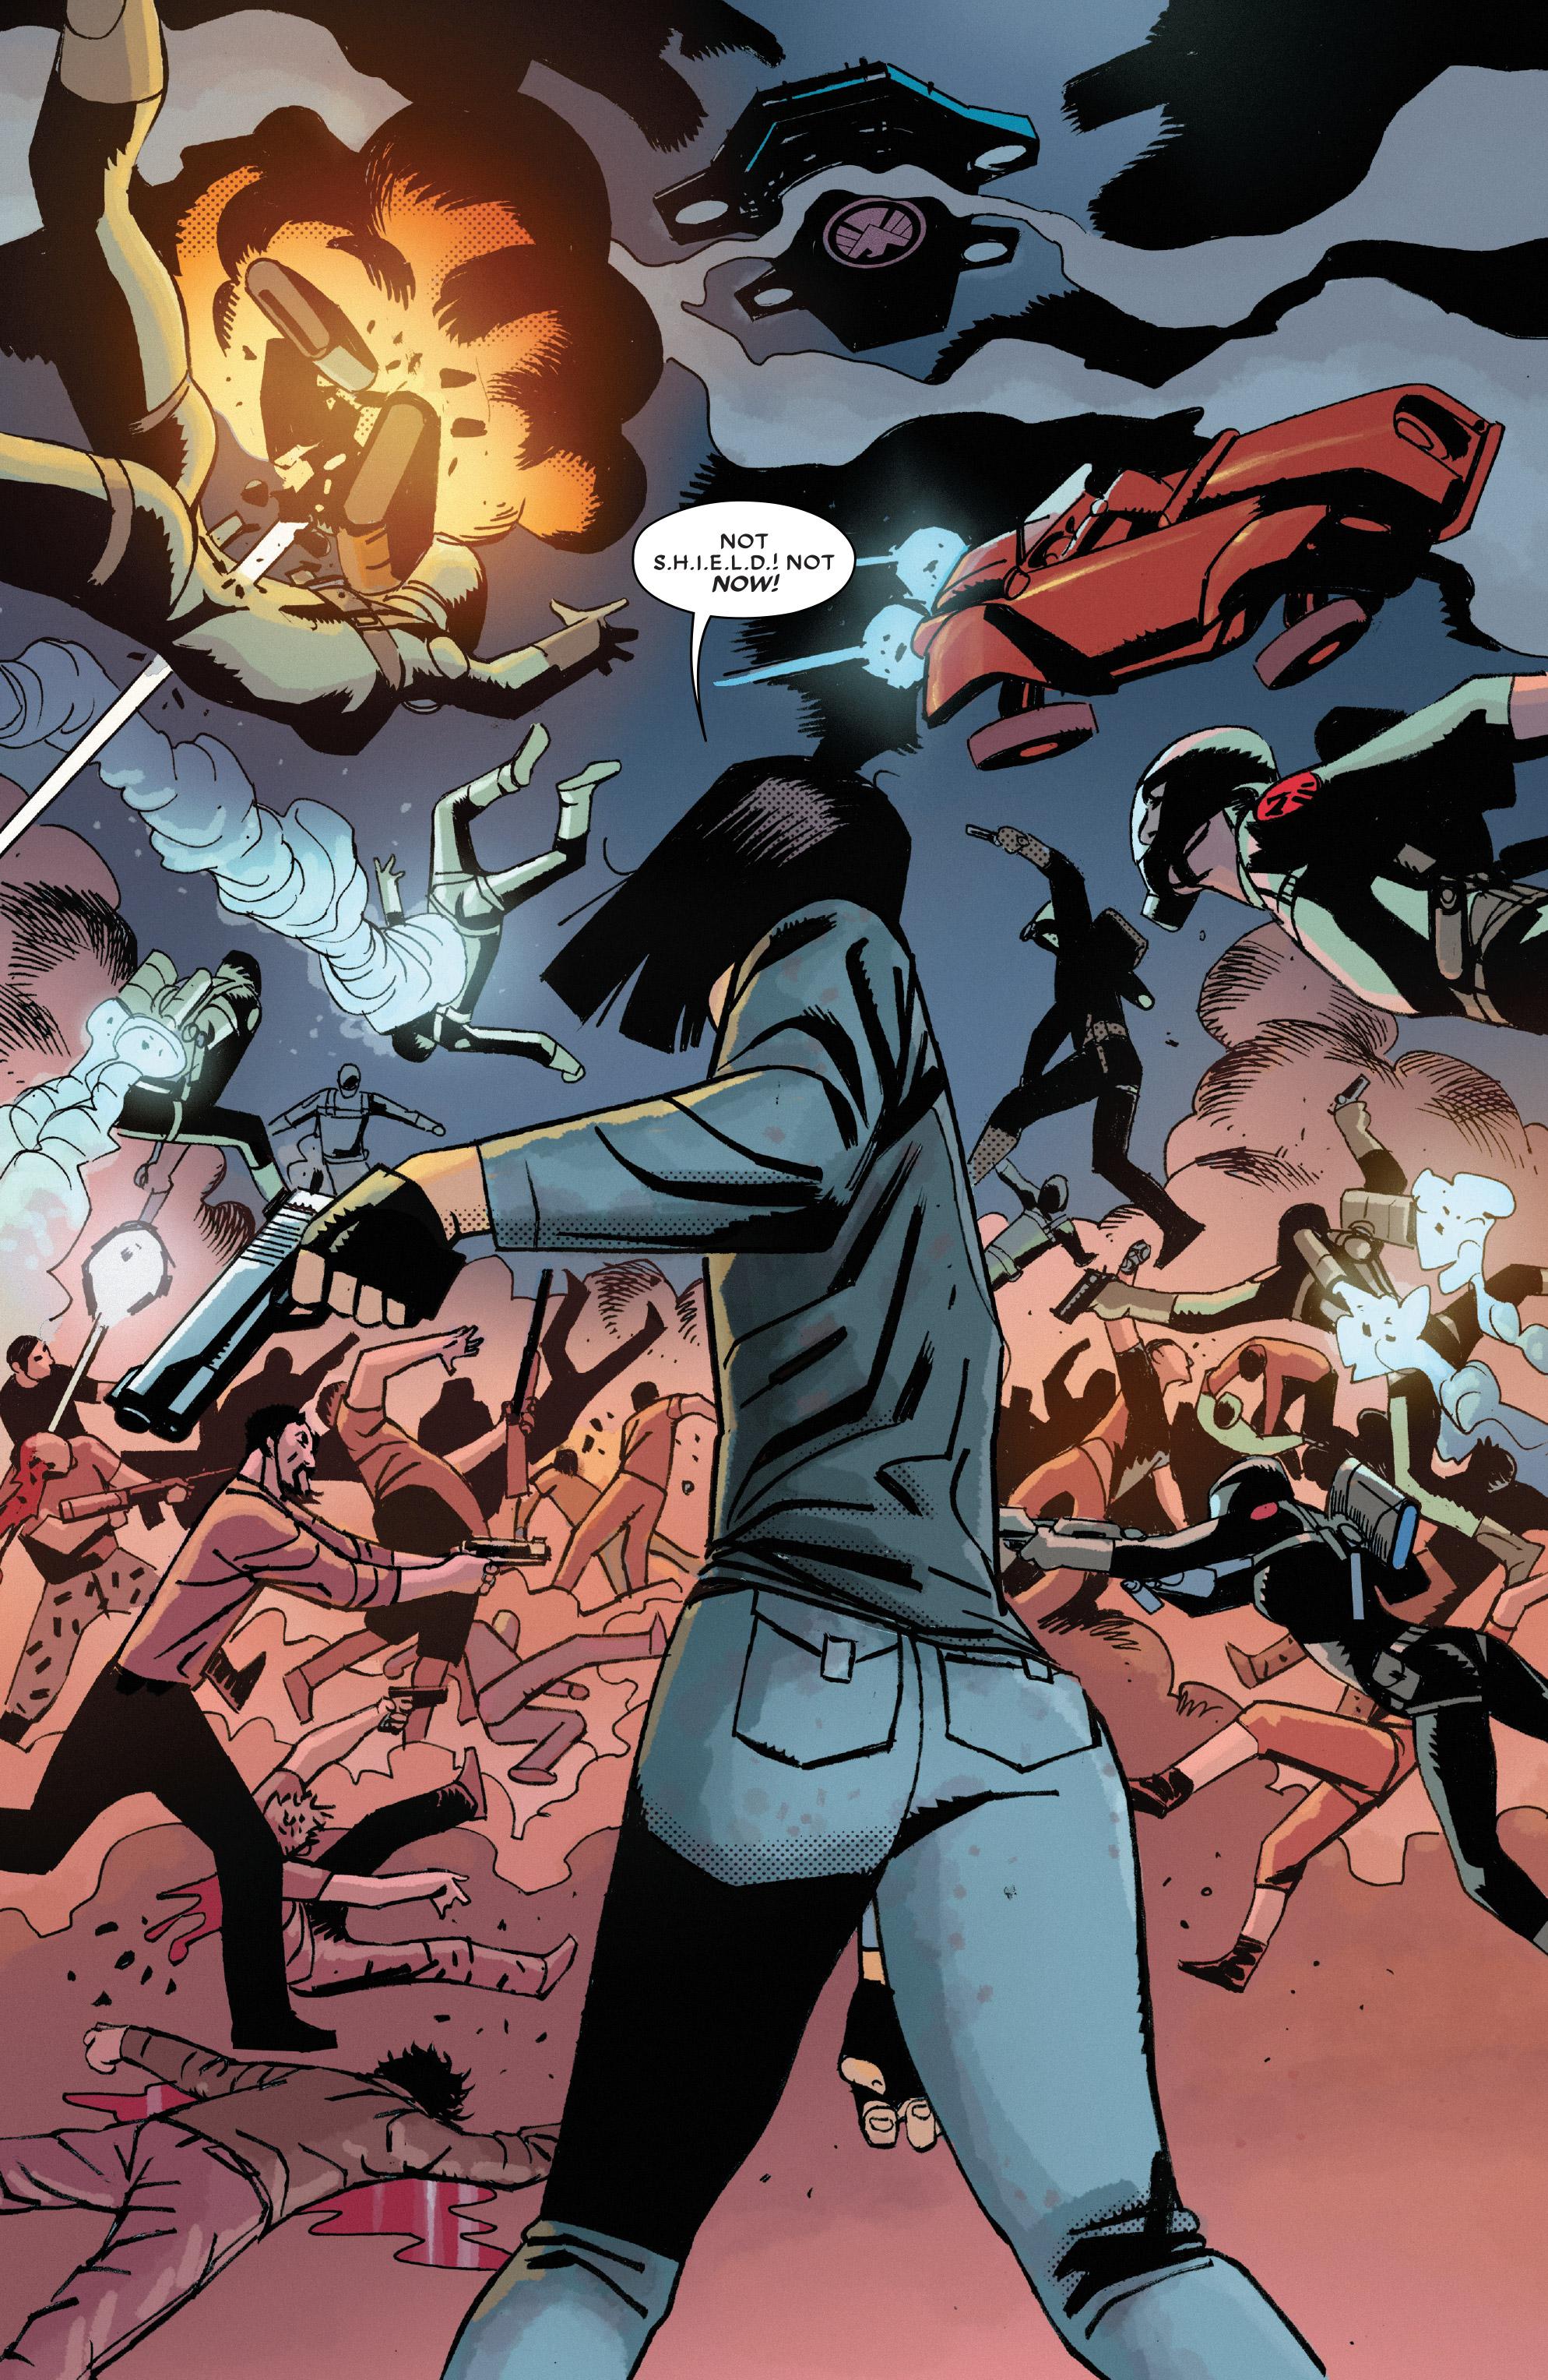 Read online Bullseye comic -  Issue #5 - 3